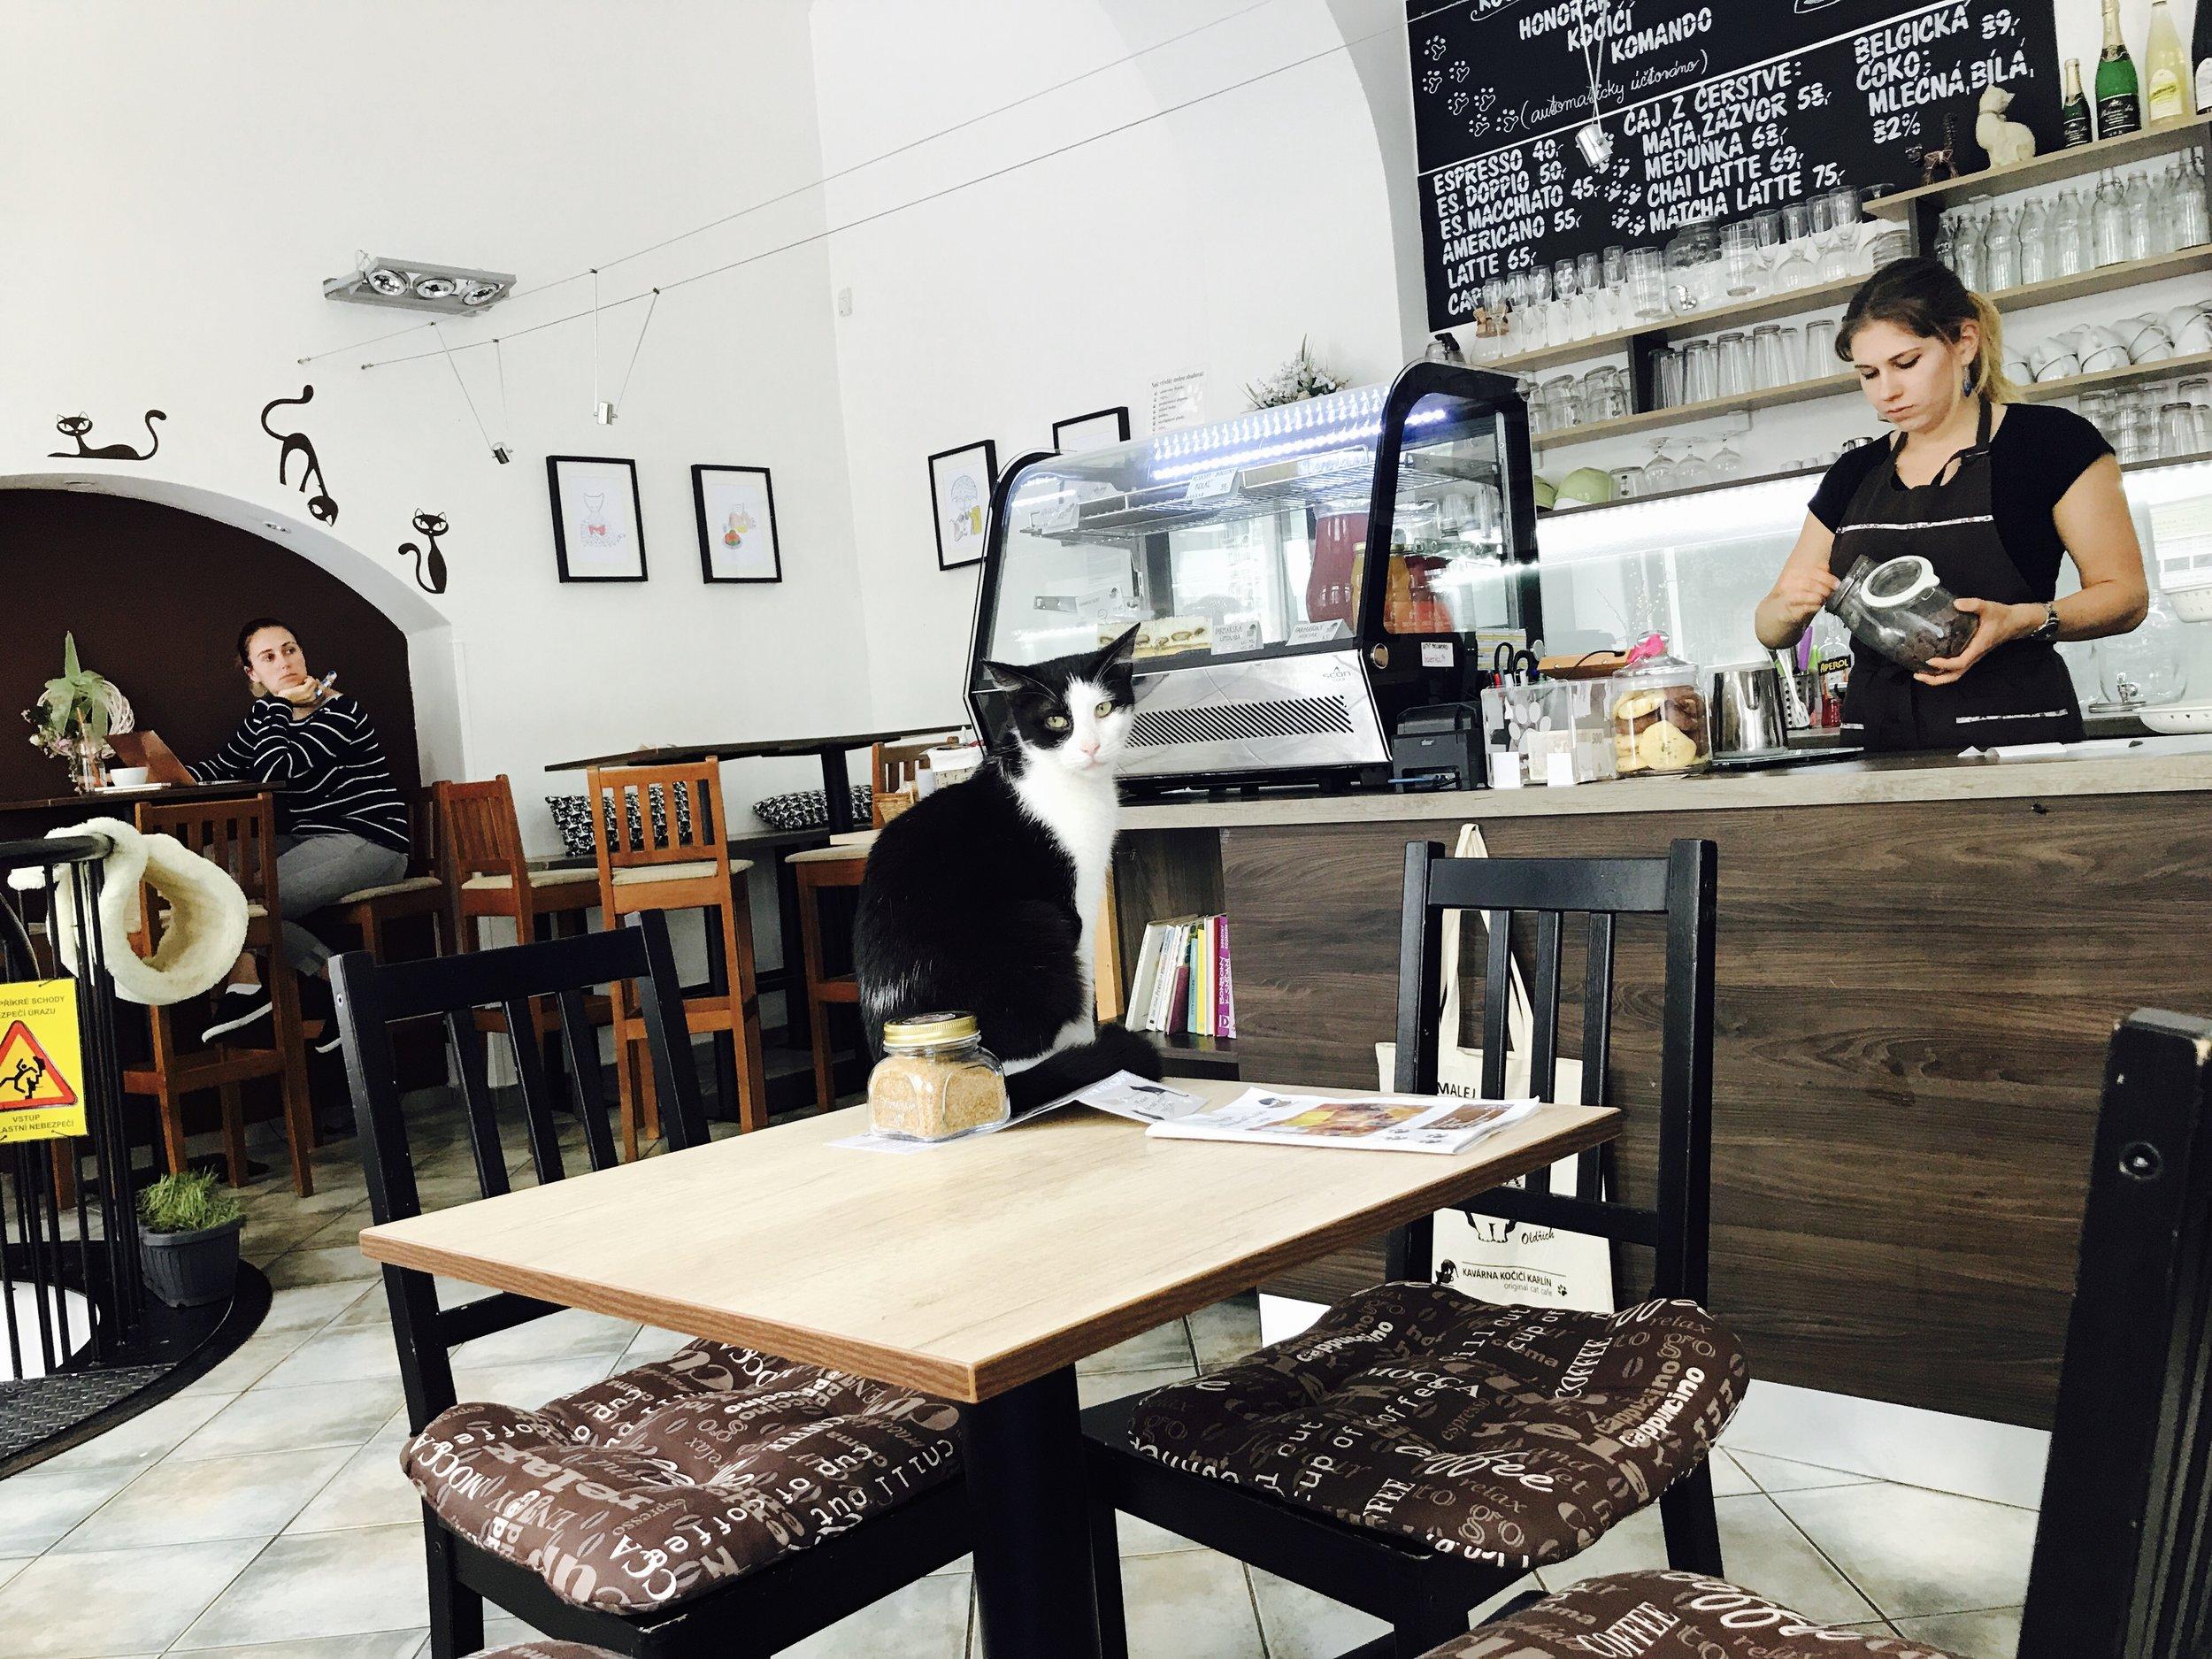 Kavarna Kocici is another beautiful cat cafe in Prague